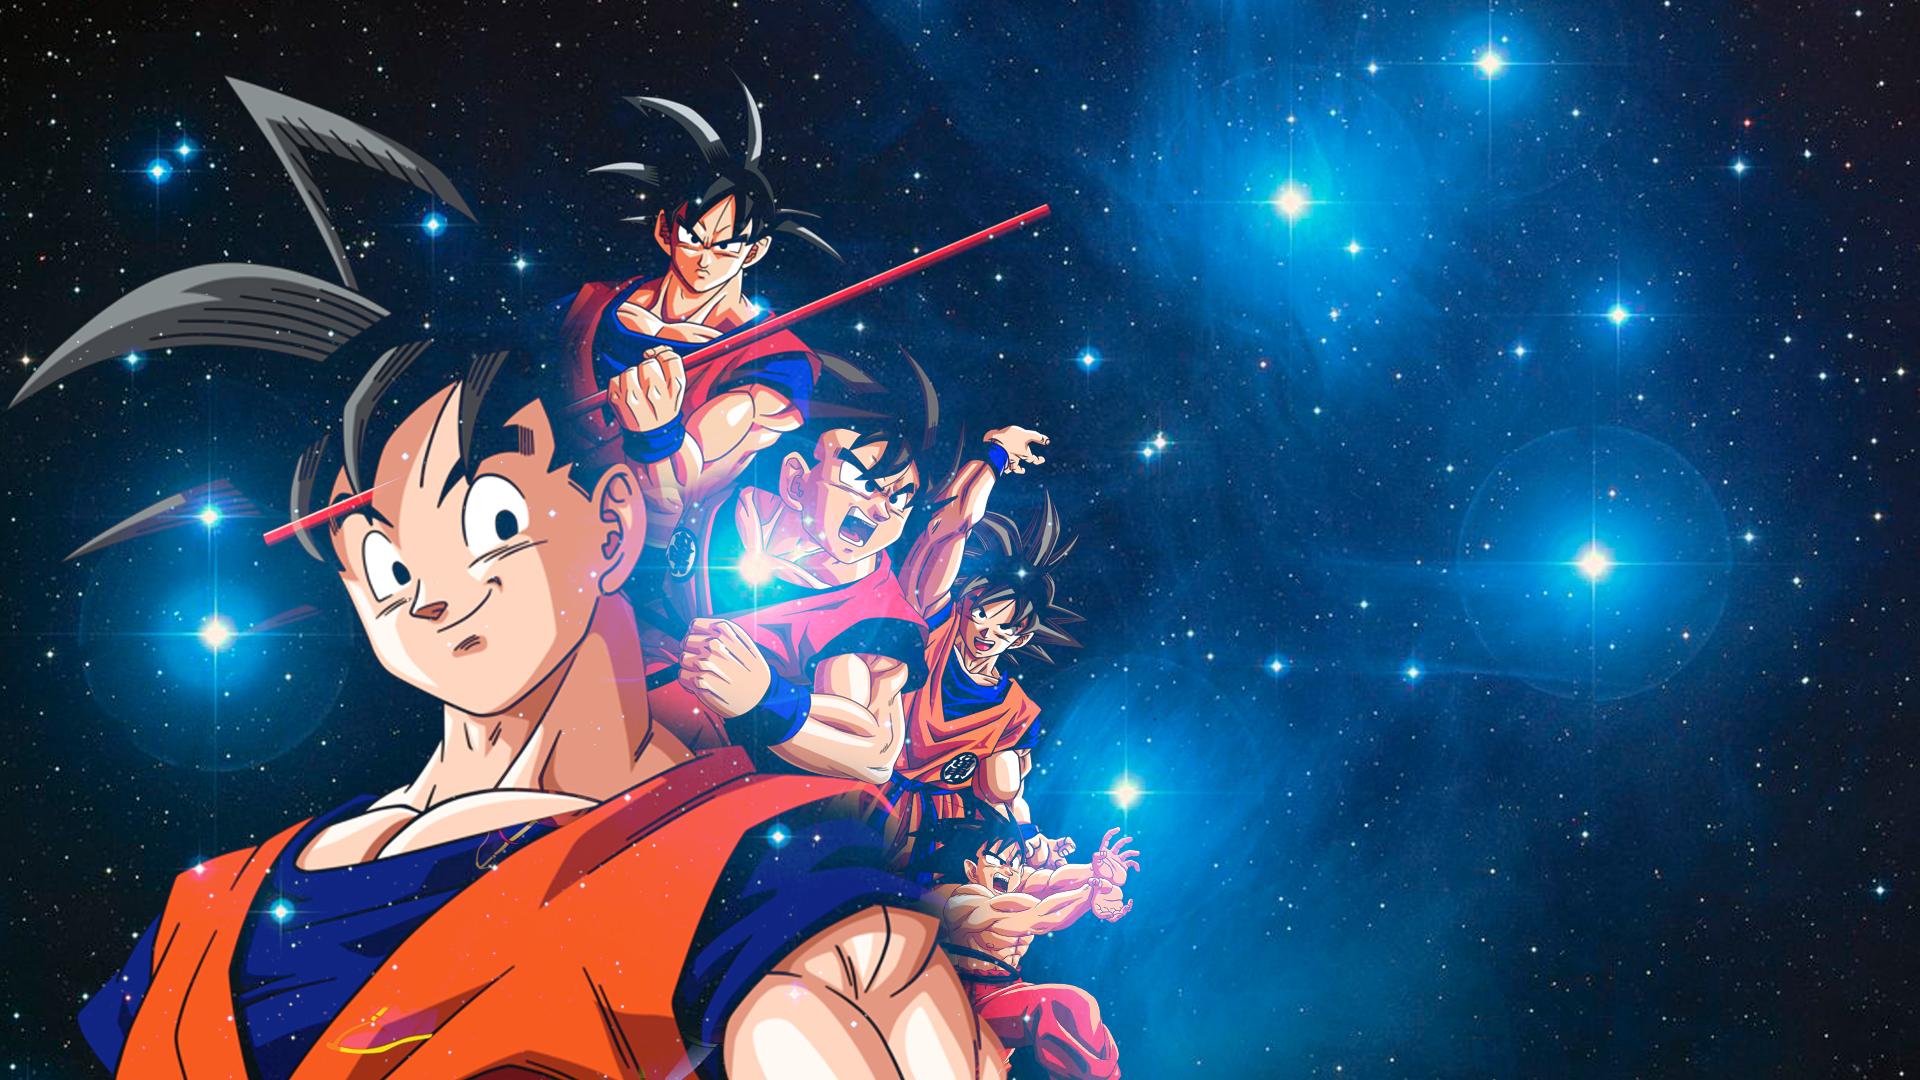 Goku Universal Hero 2 By Son Of Bardock On DeviantArt